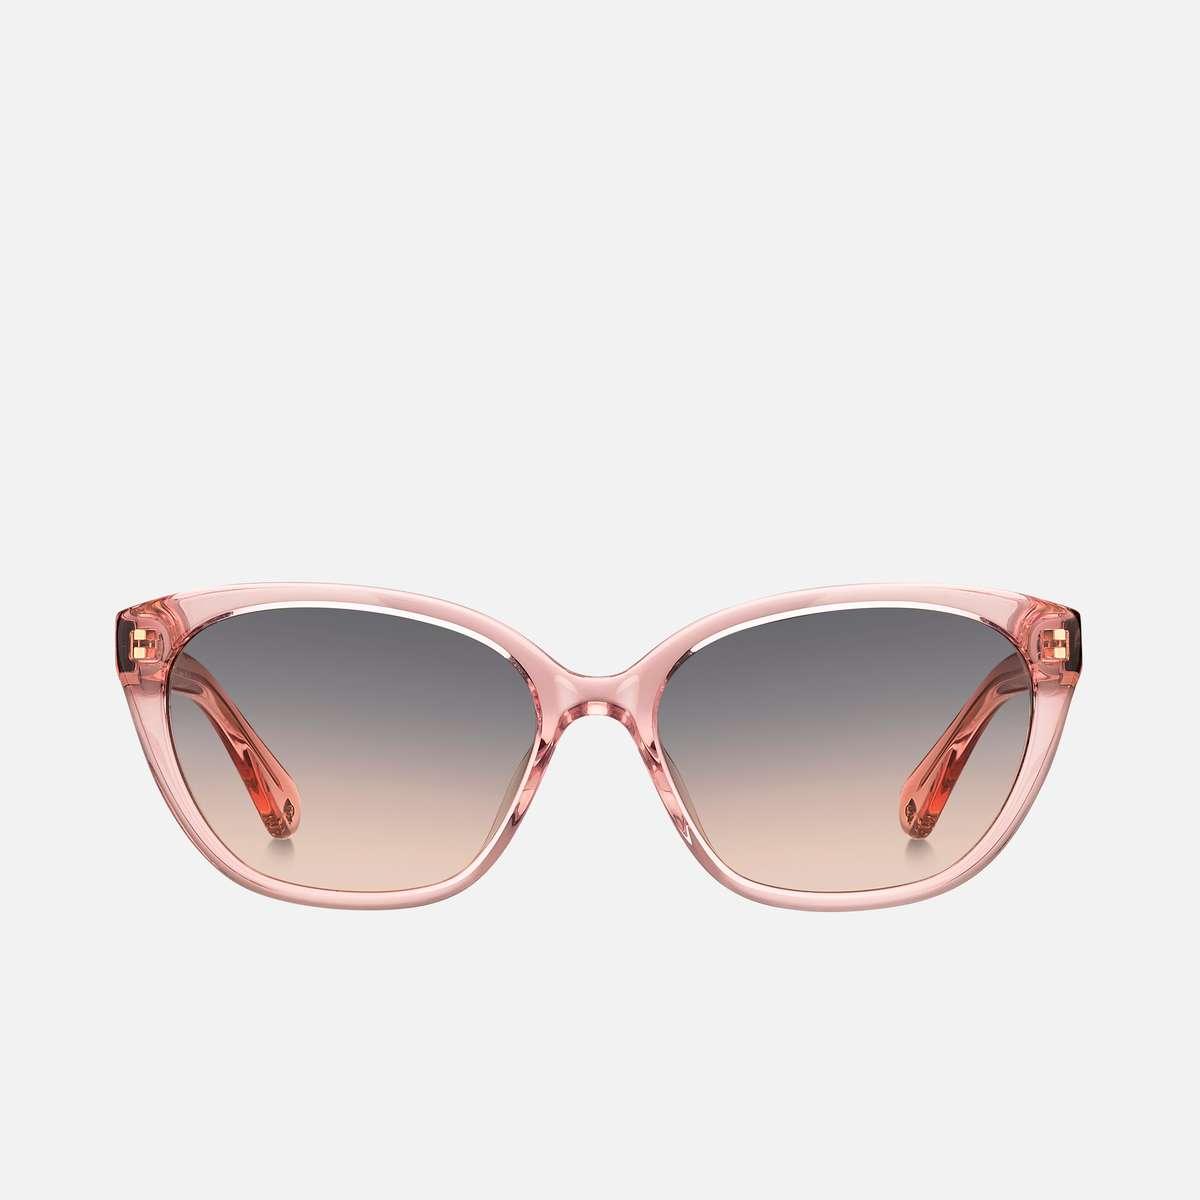 2.KATE SPADE NEW YORK Women UV-Protected Square Sunglasses- PHILIPPA-G-S